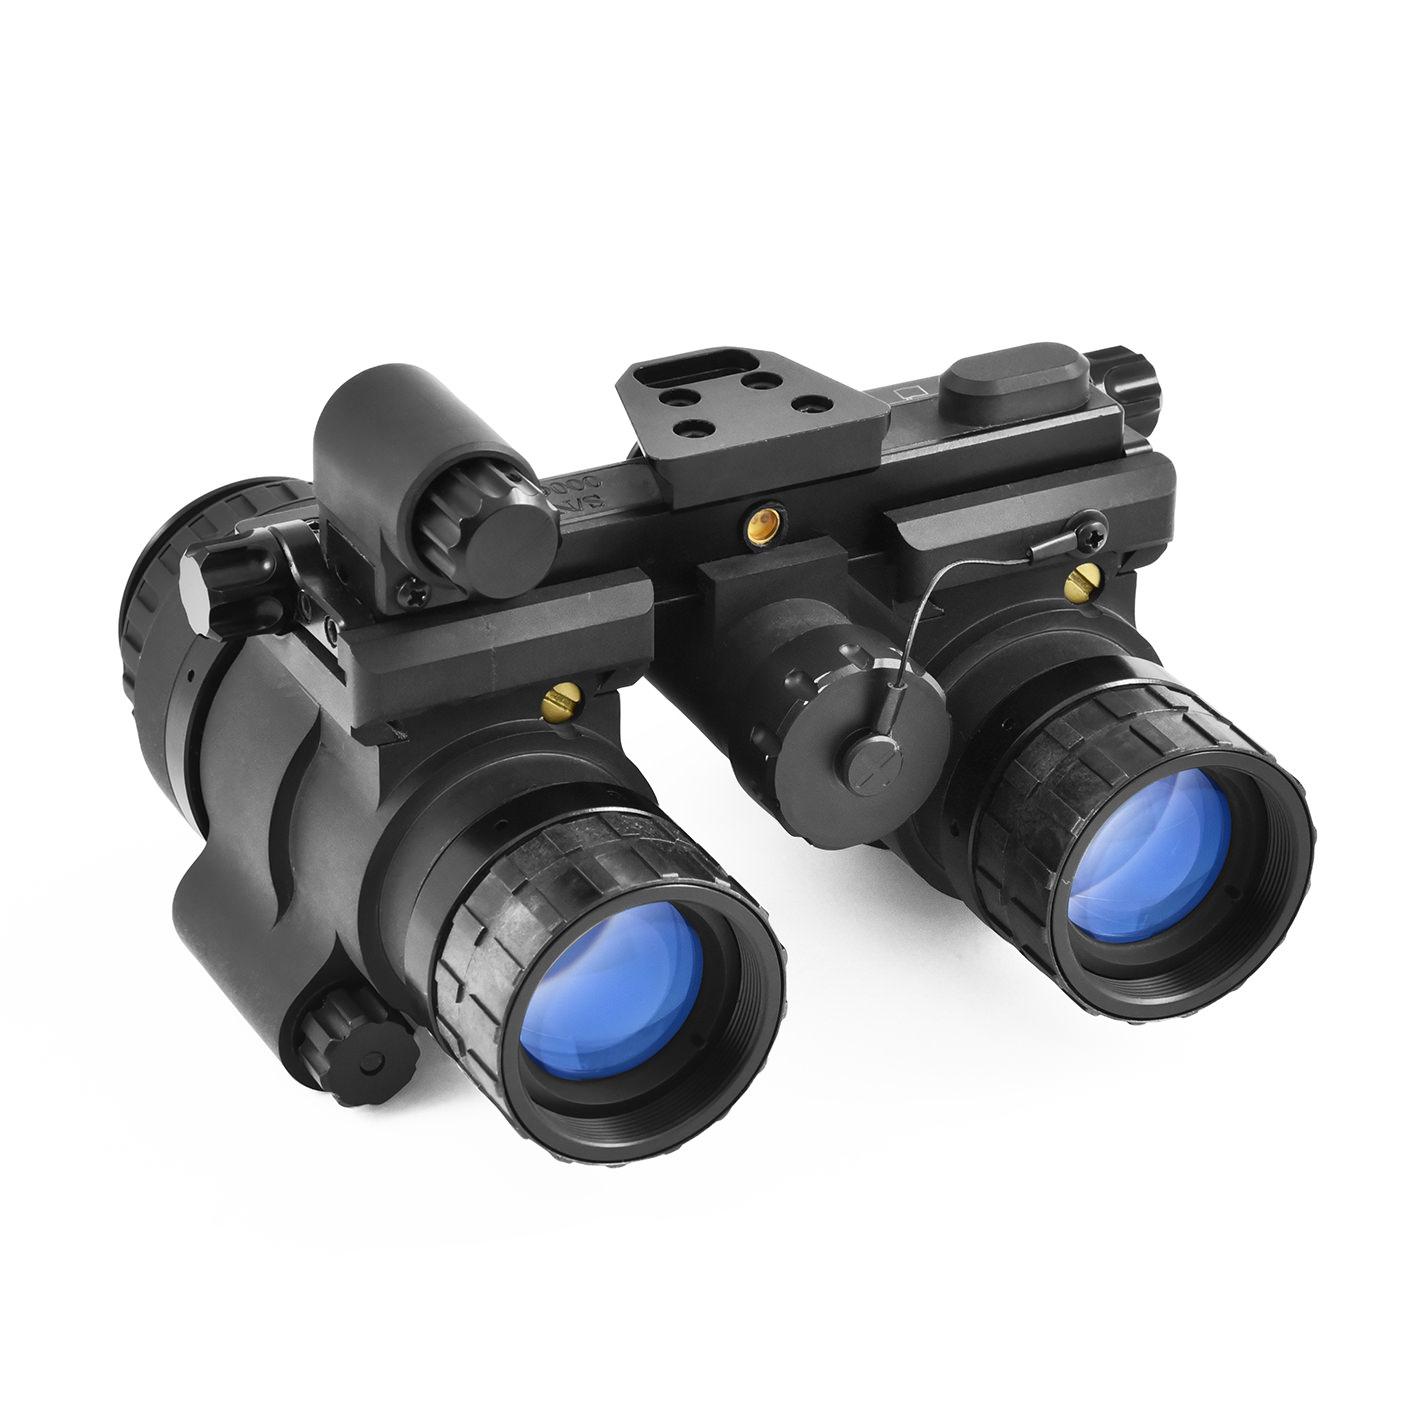 BMNVDG Night Vision Binocular/Monocular